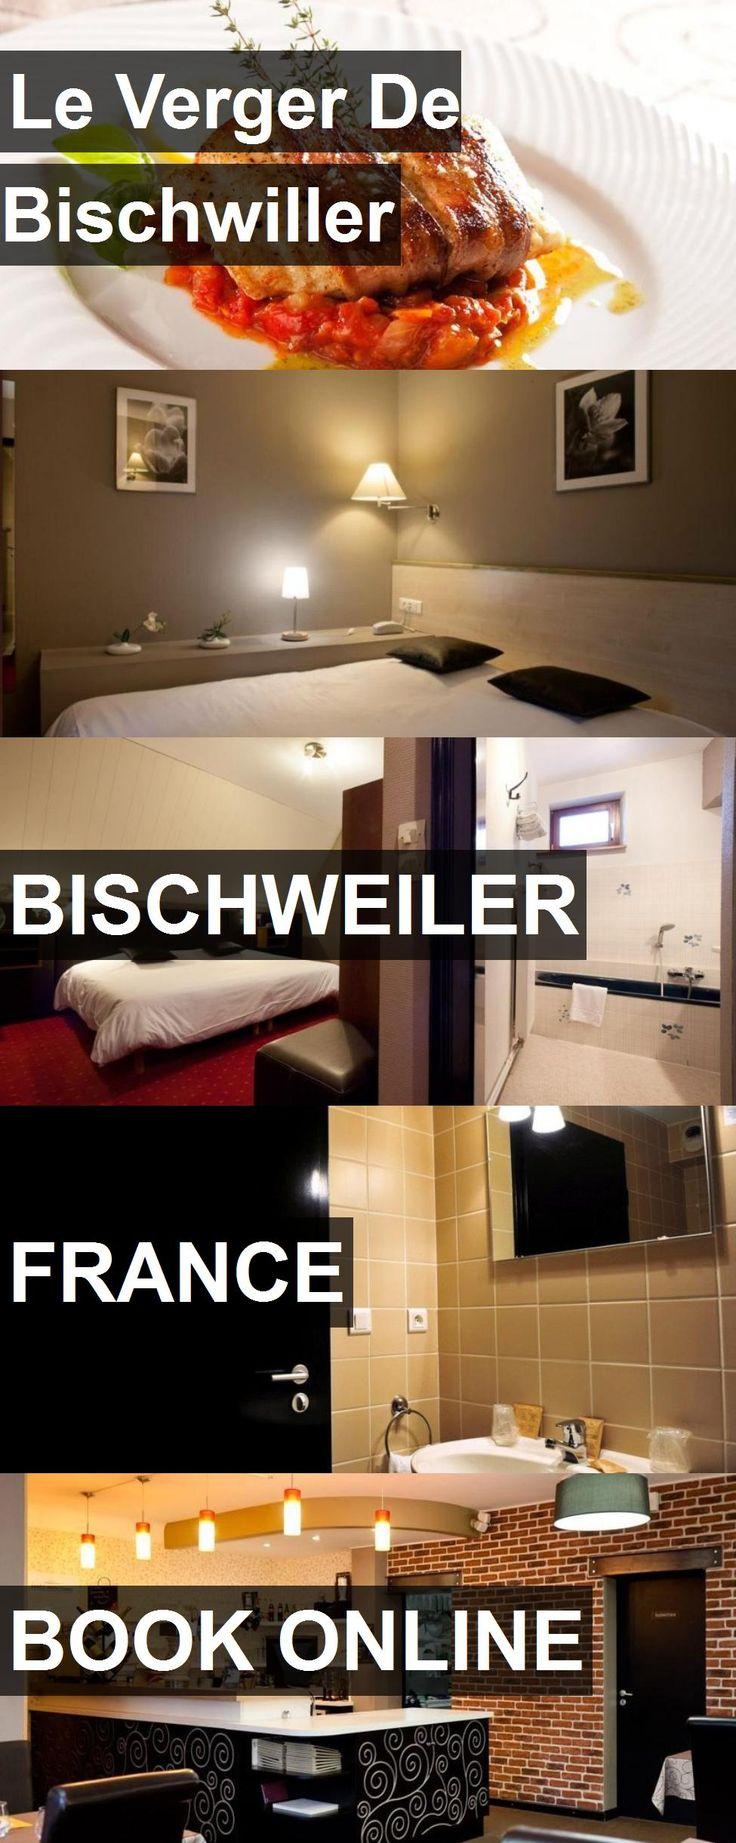 Hotel Le Verger De Bischwiller in Bischweiler, France. For more information, photos, reviews and best prices please follow the link. #France #Bischweiler #travel #vacation #hotel